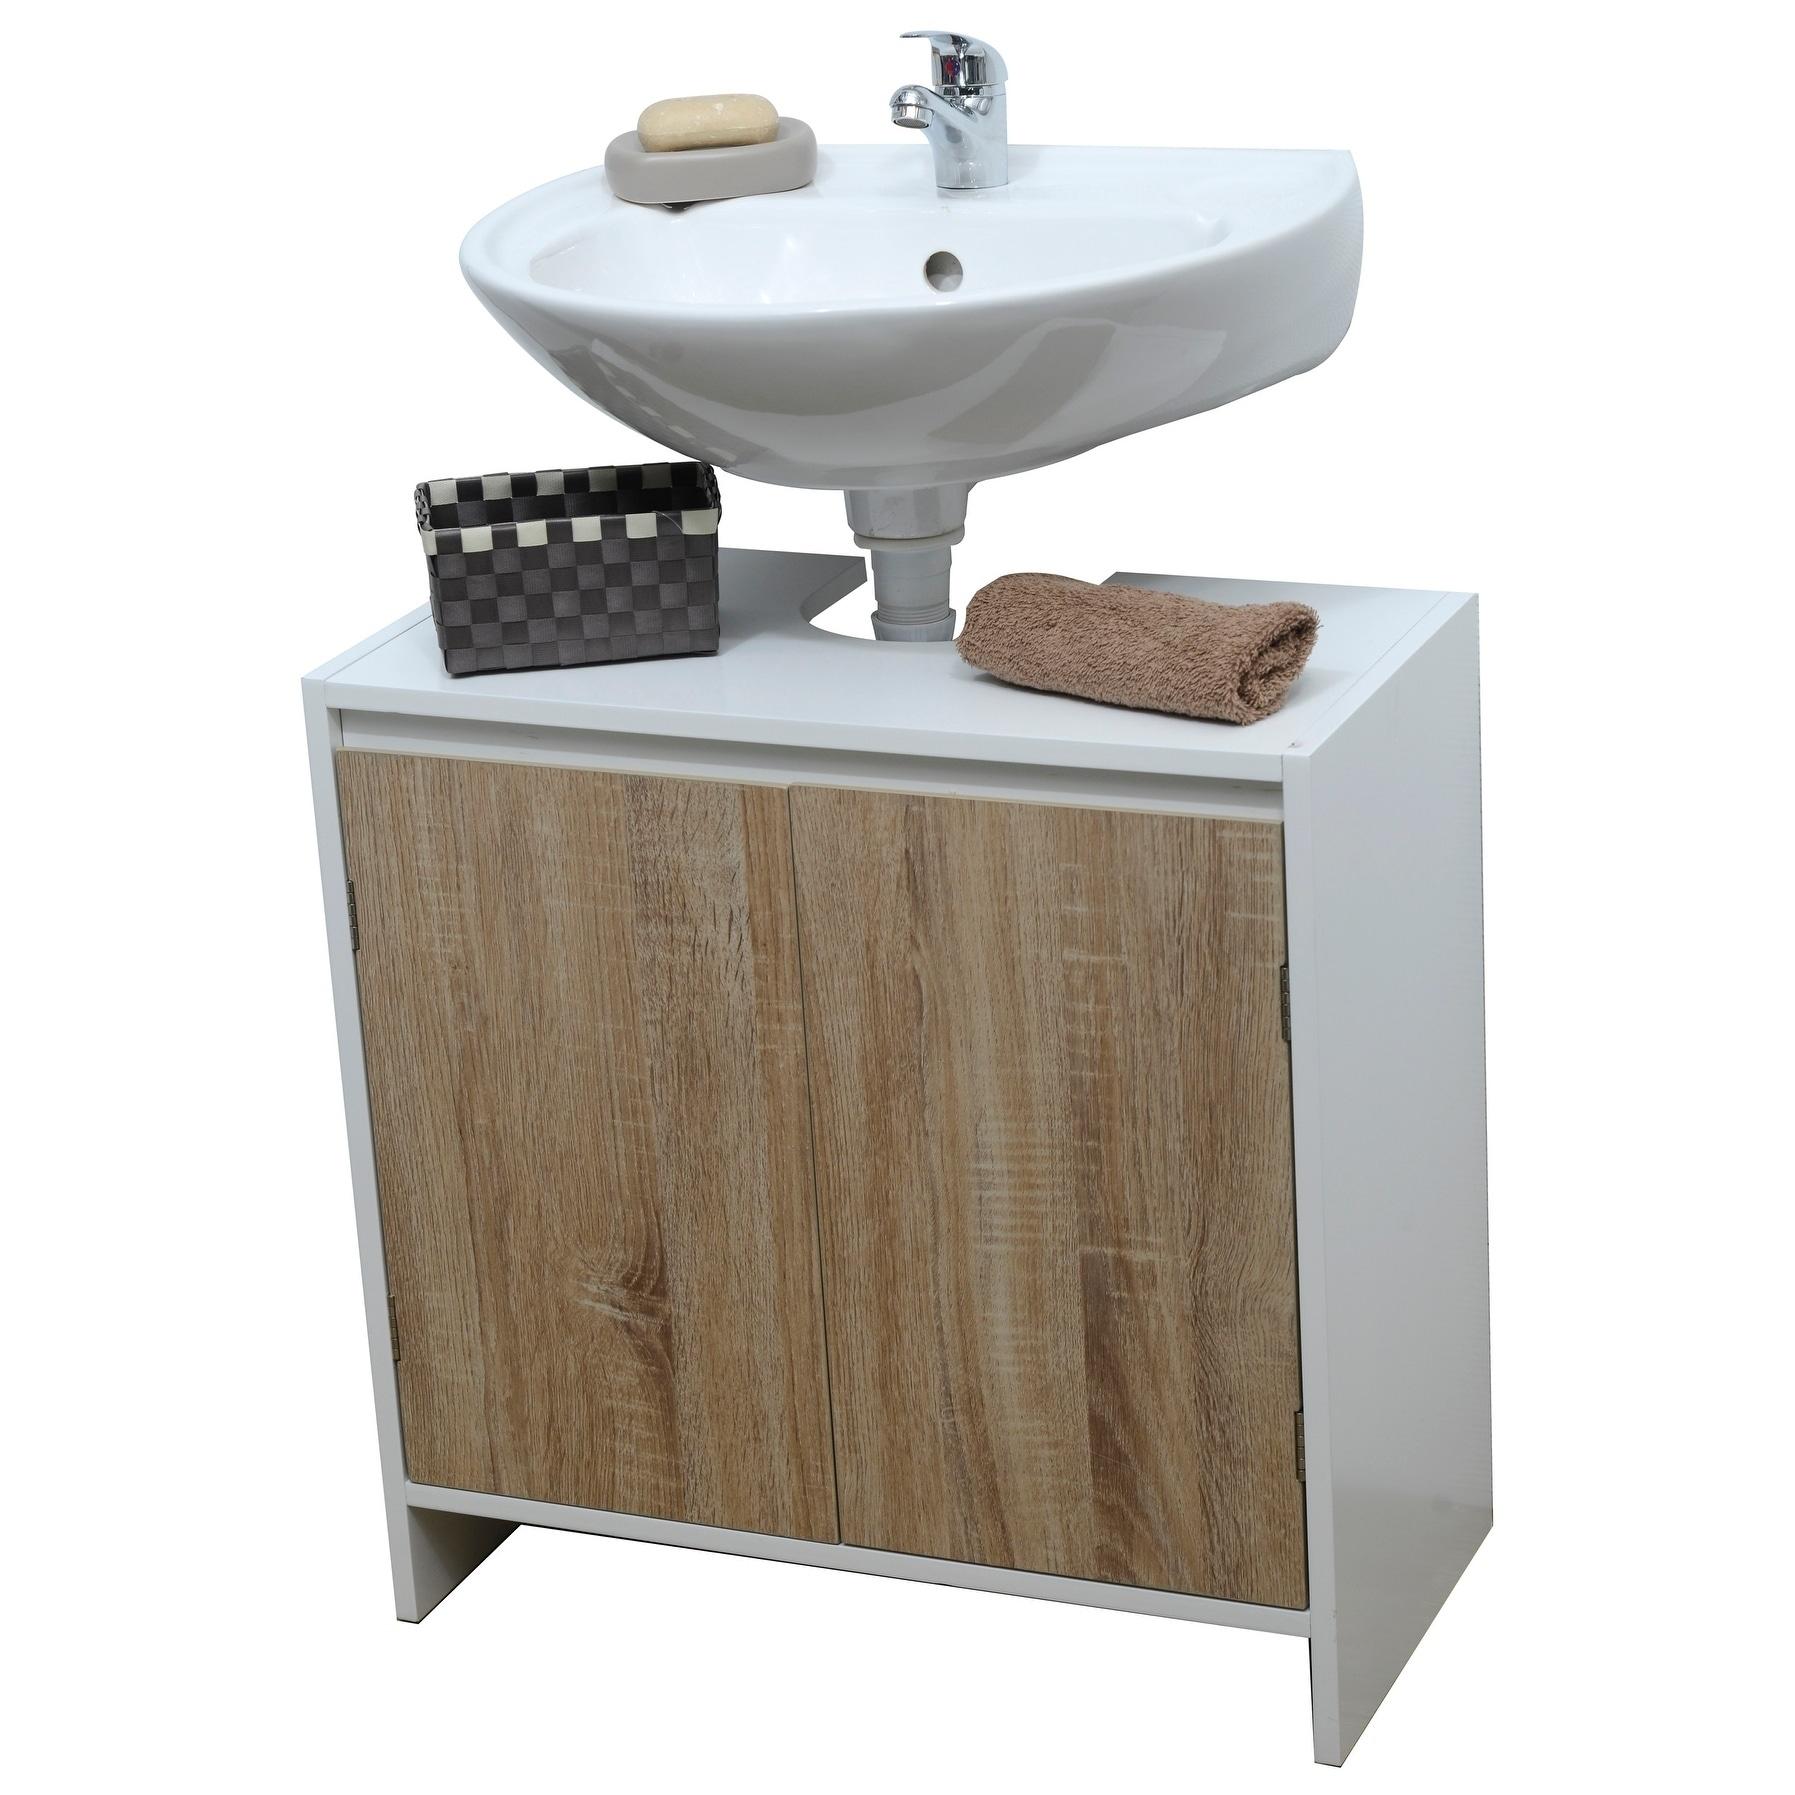 Bathroom Under Sink Vanity Cabinet